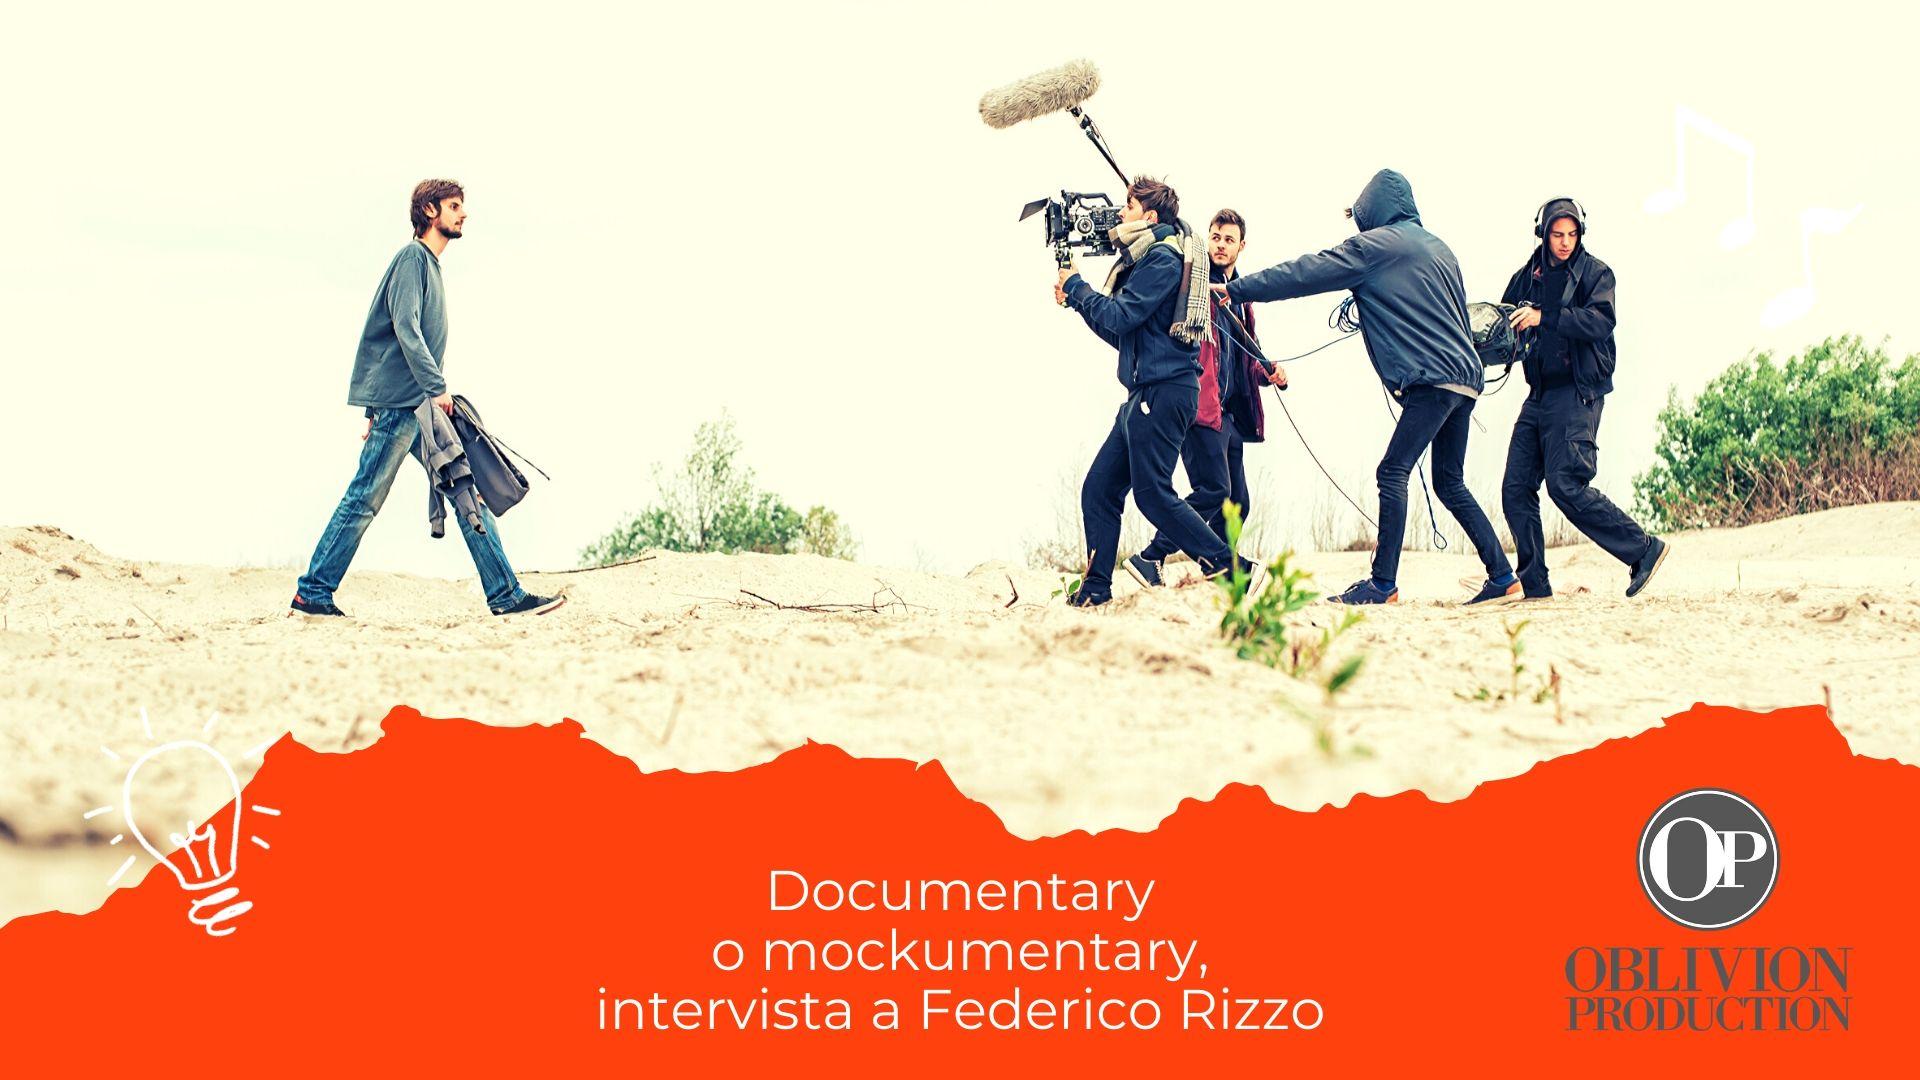 Documentary o mockumentary, intervista a Federico Rizzo